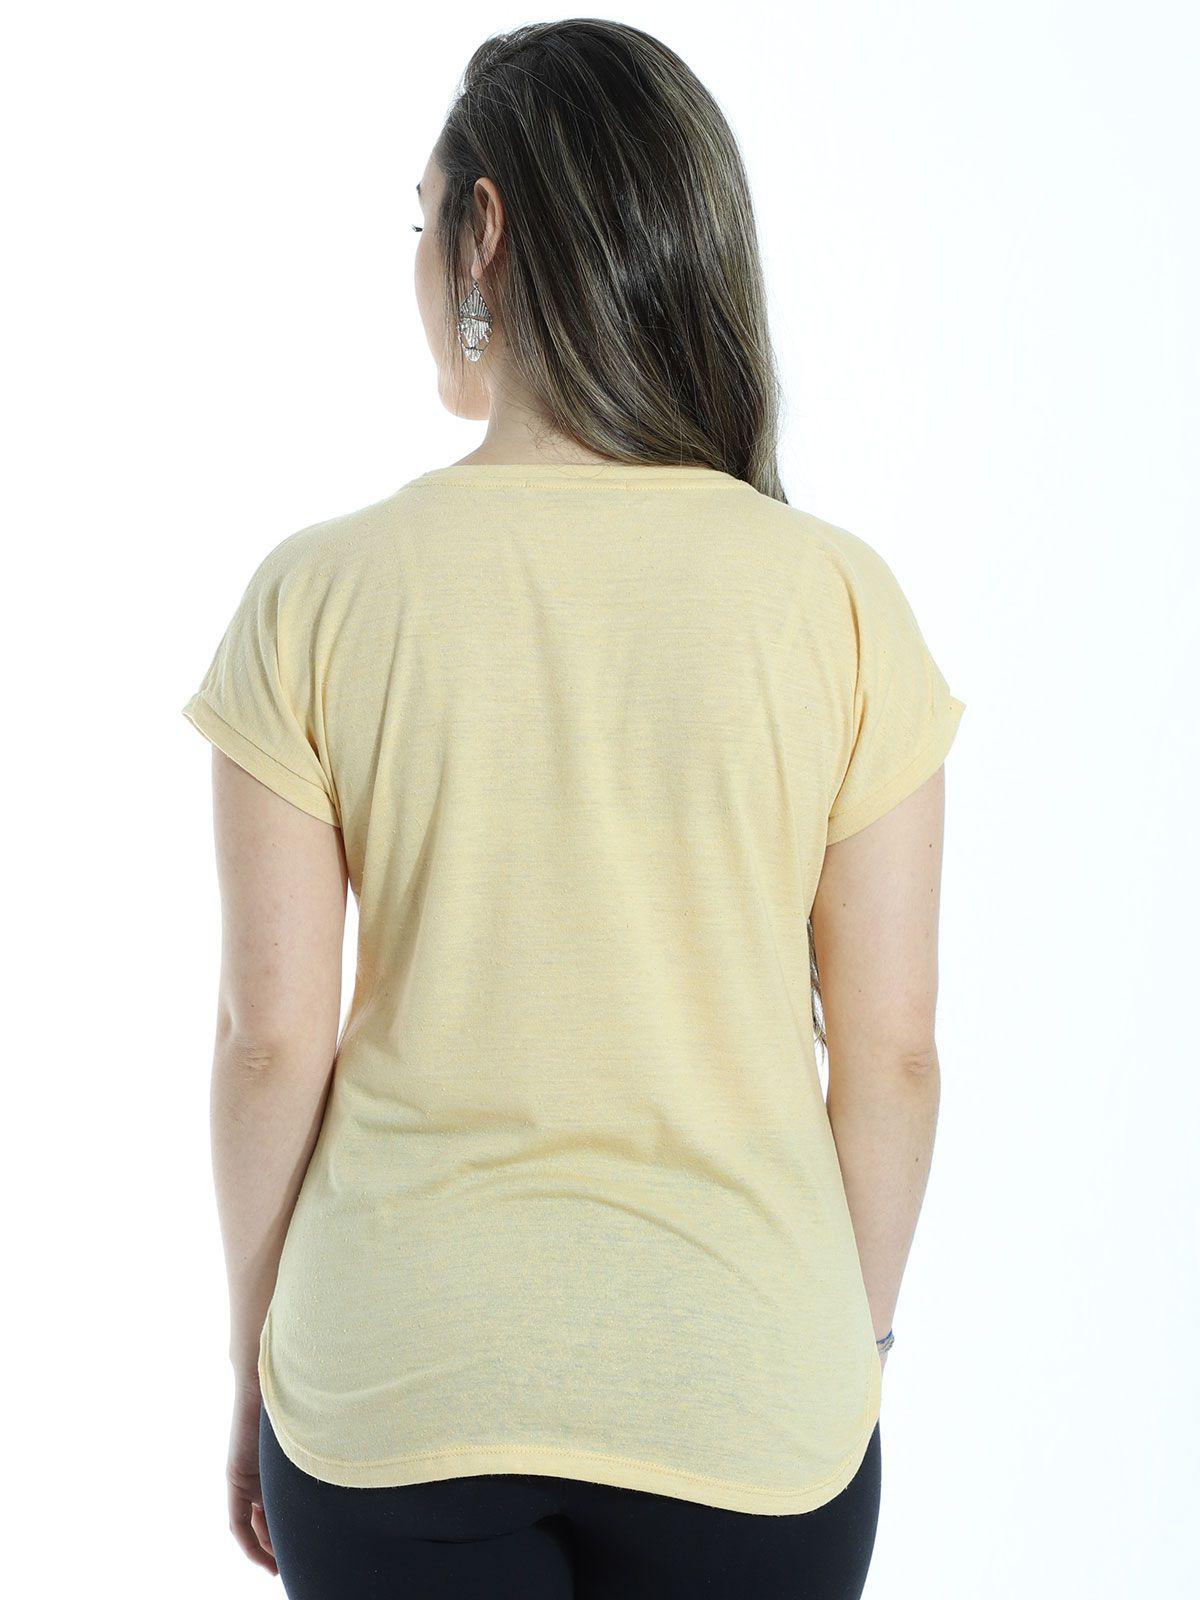 Blusa Anistia Recortes Ombro Amarelo